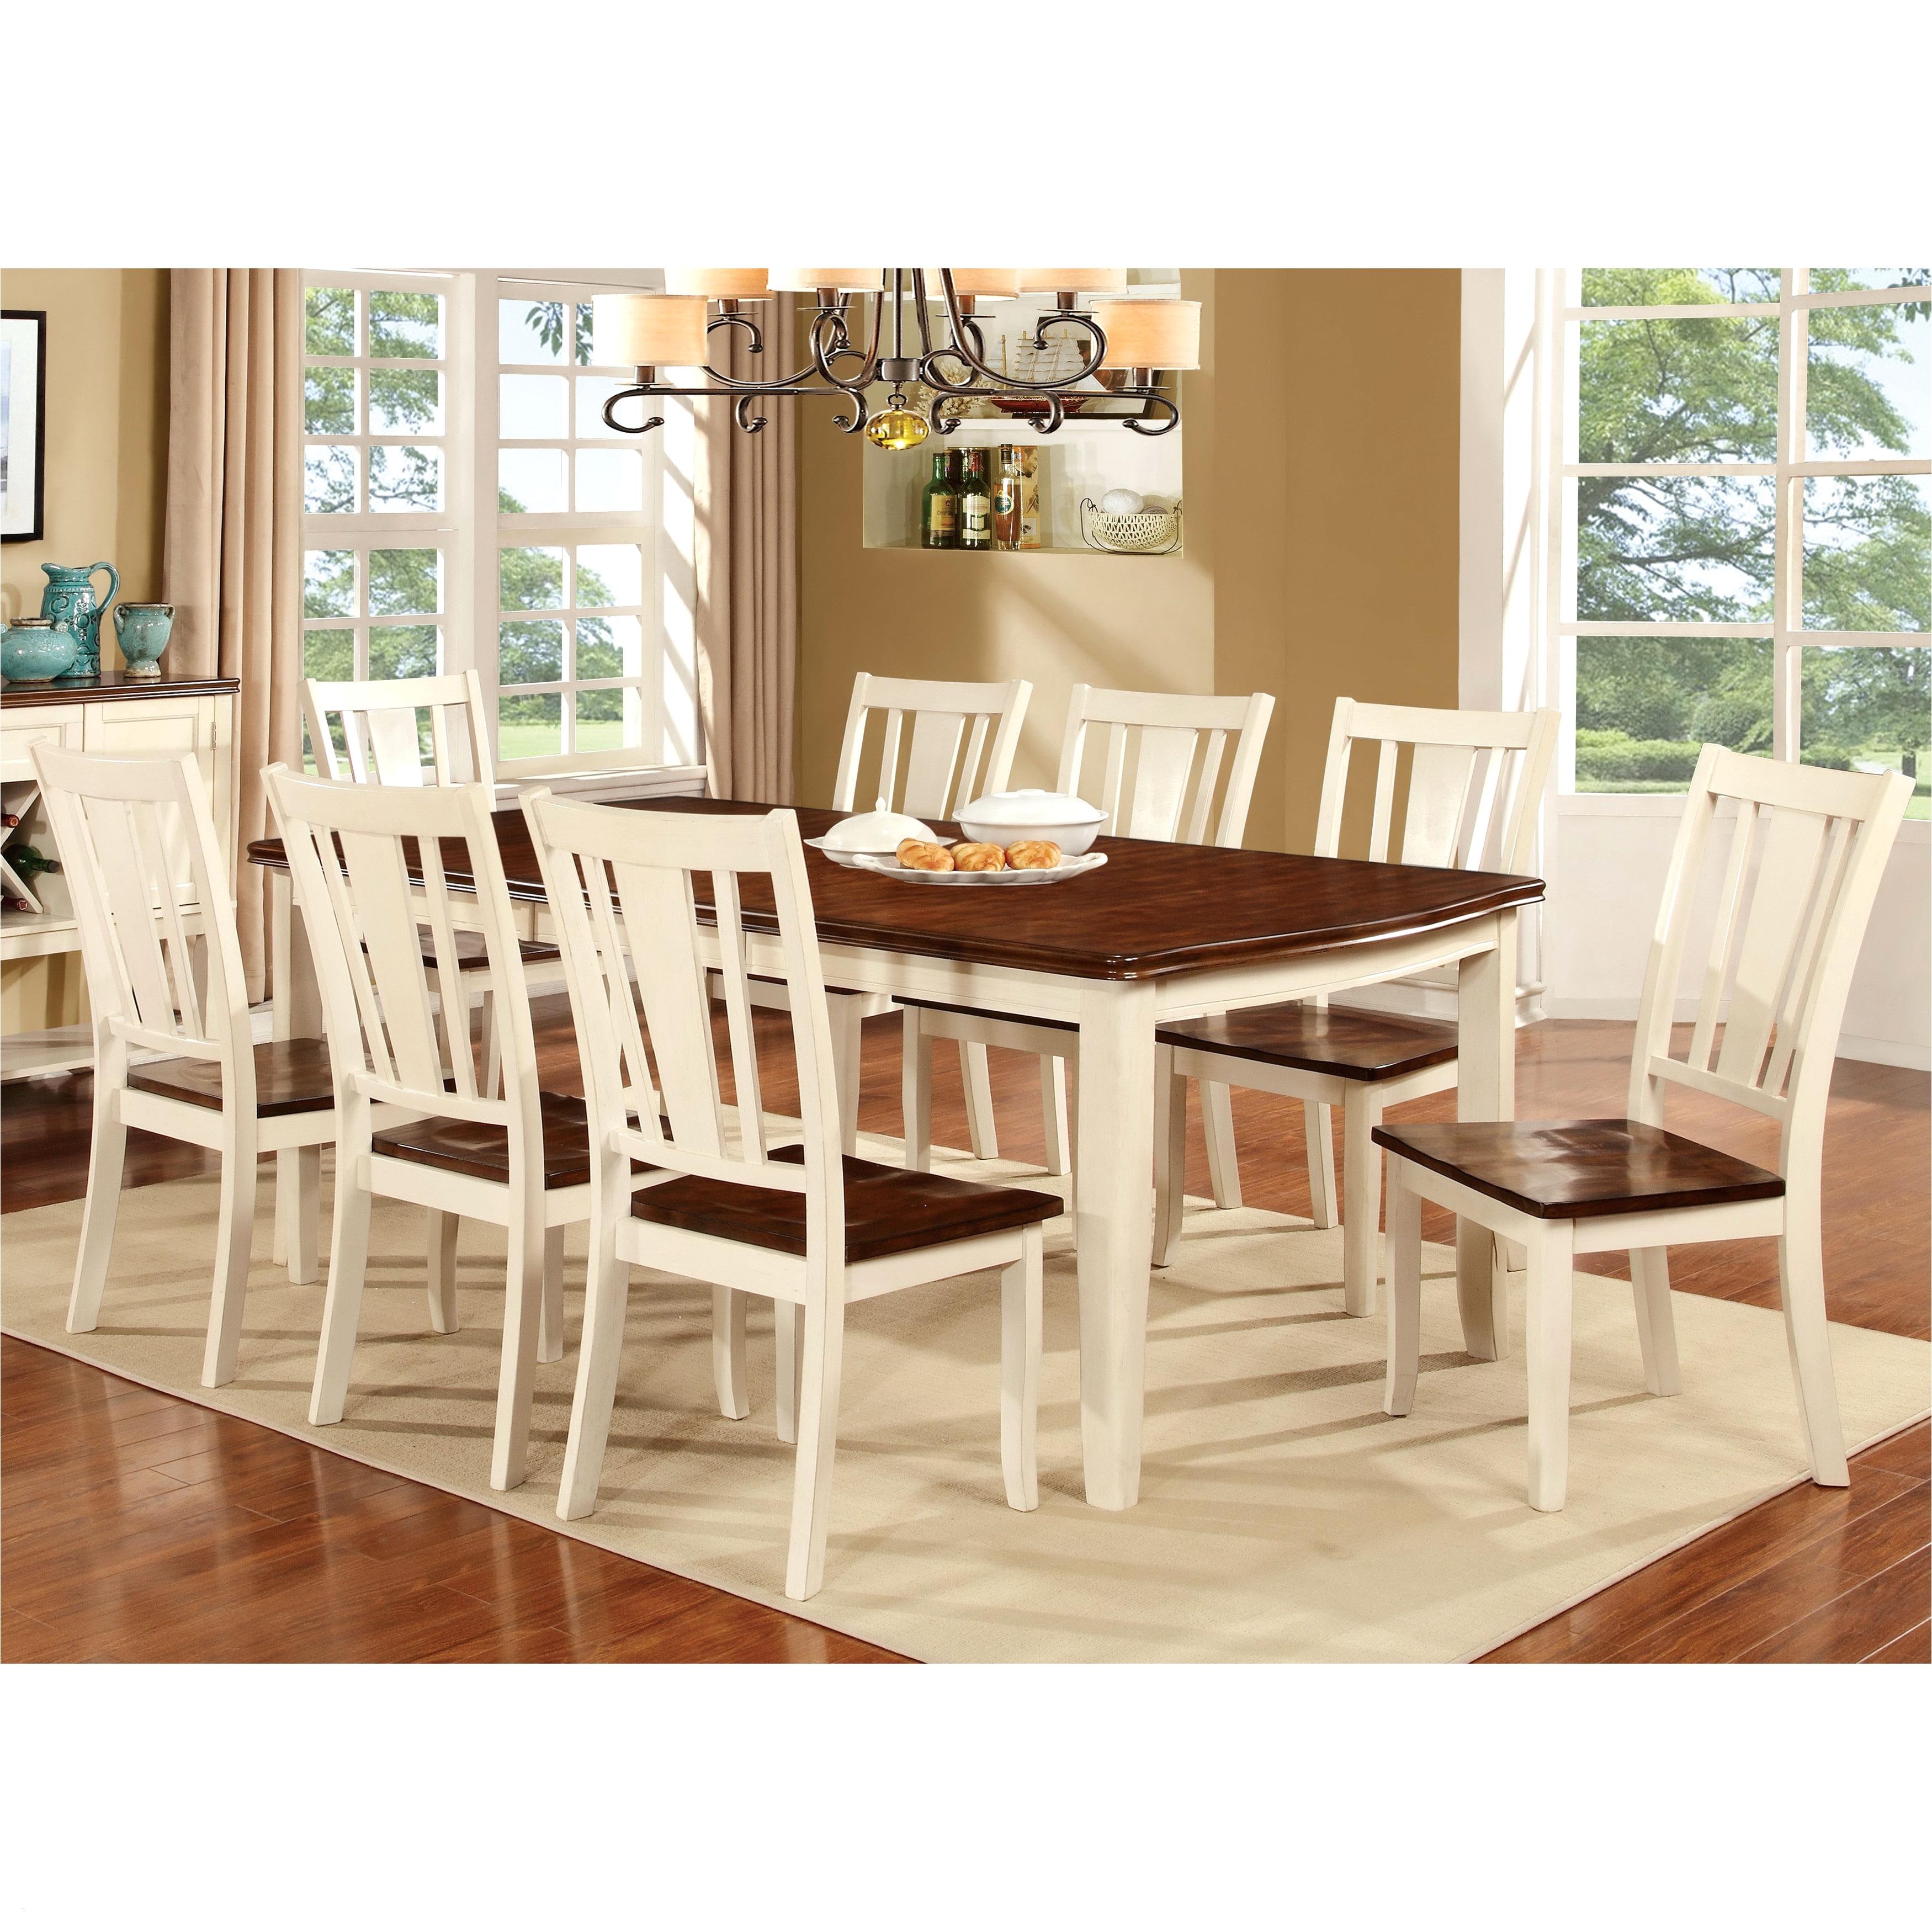 Wicks Furniture Walmart Outdoor Patio Furniture Beautiful Dining Room Chair Covers